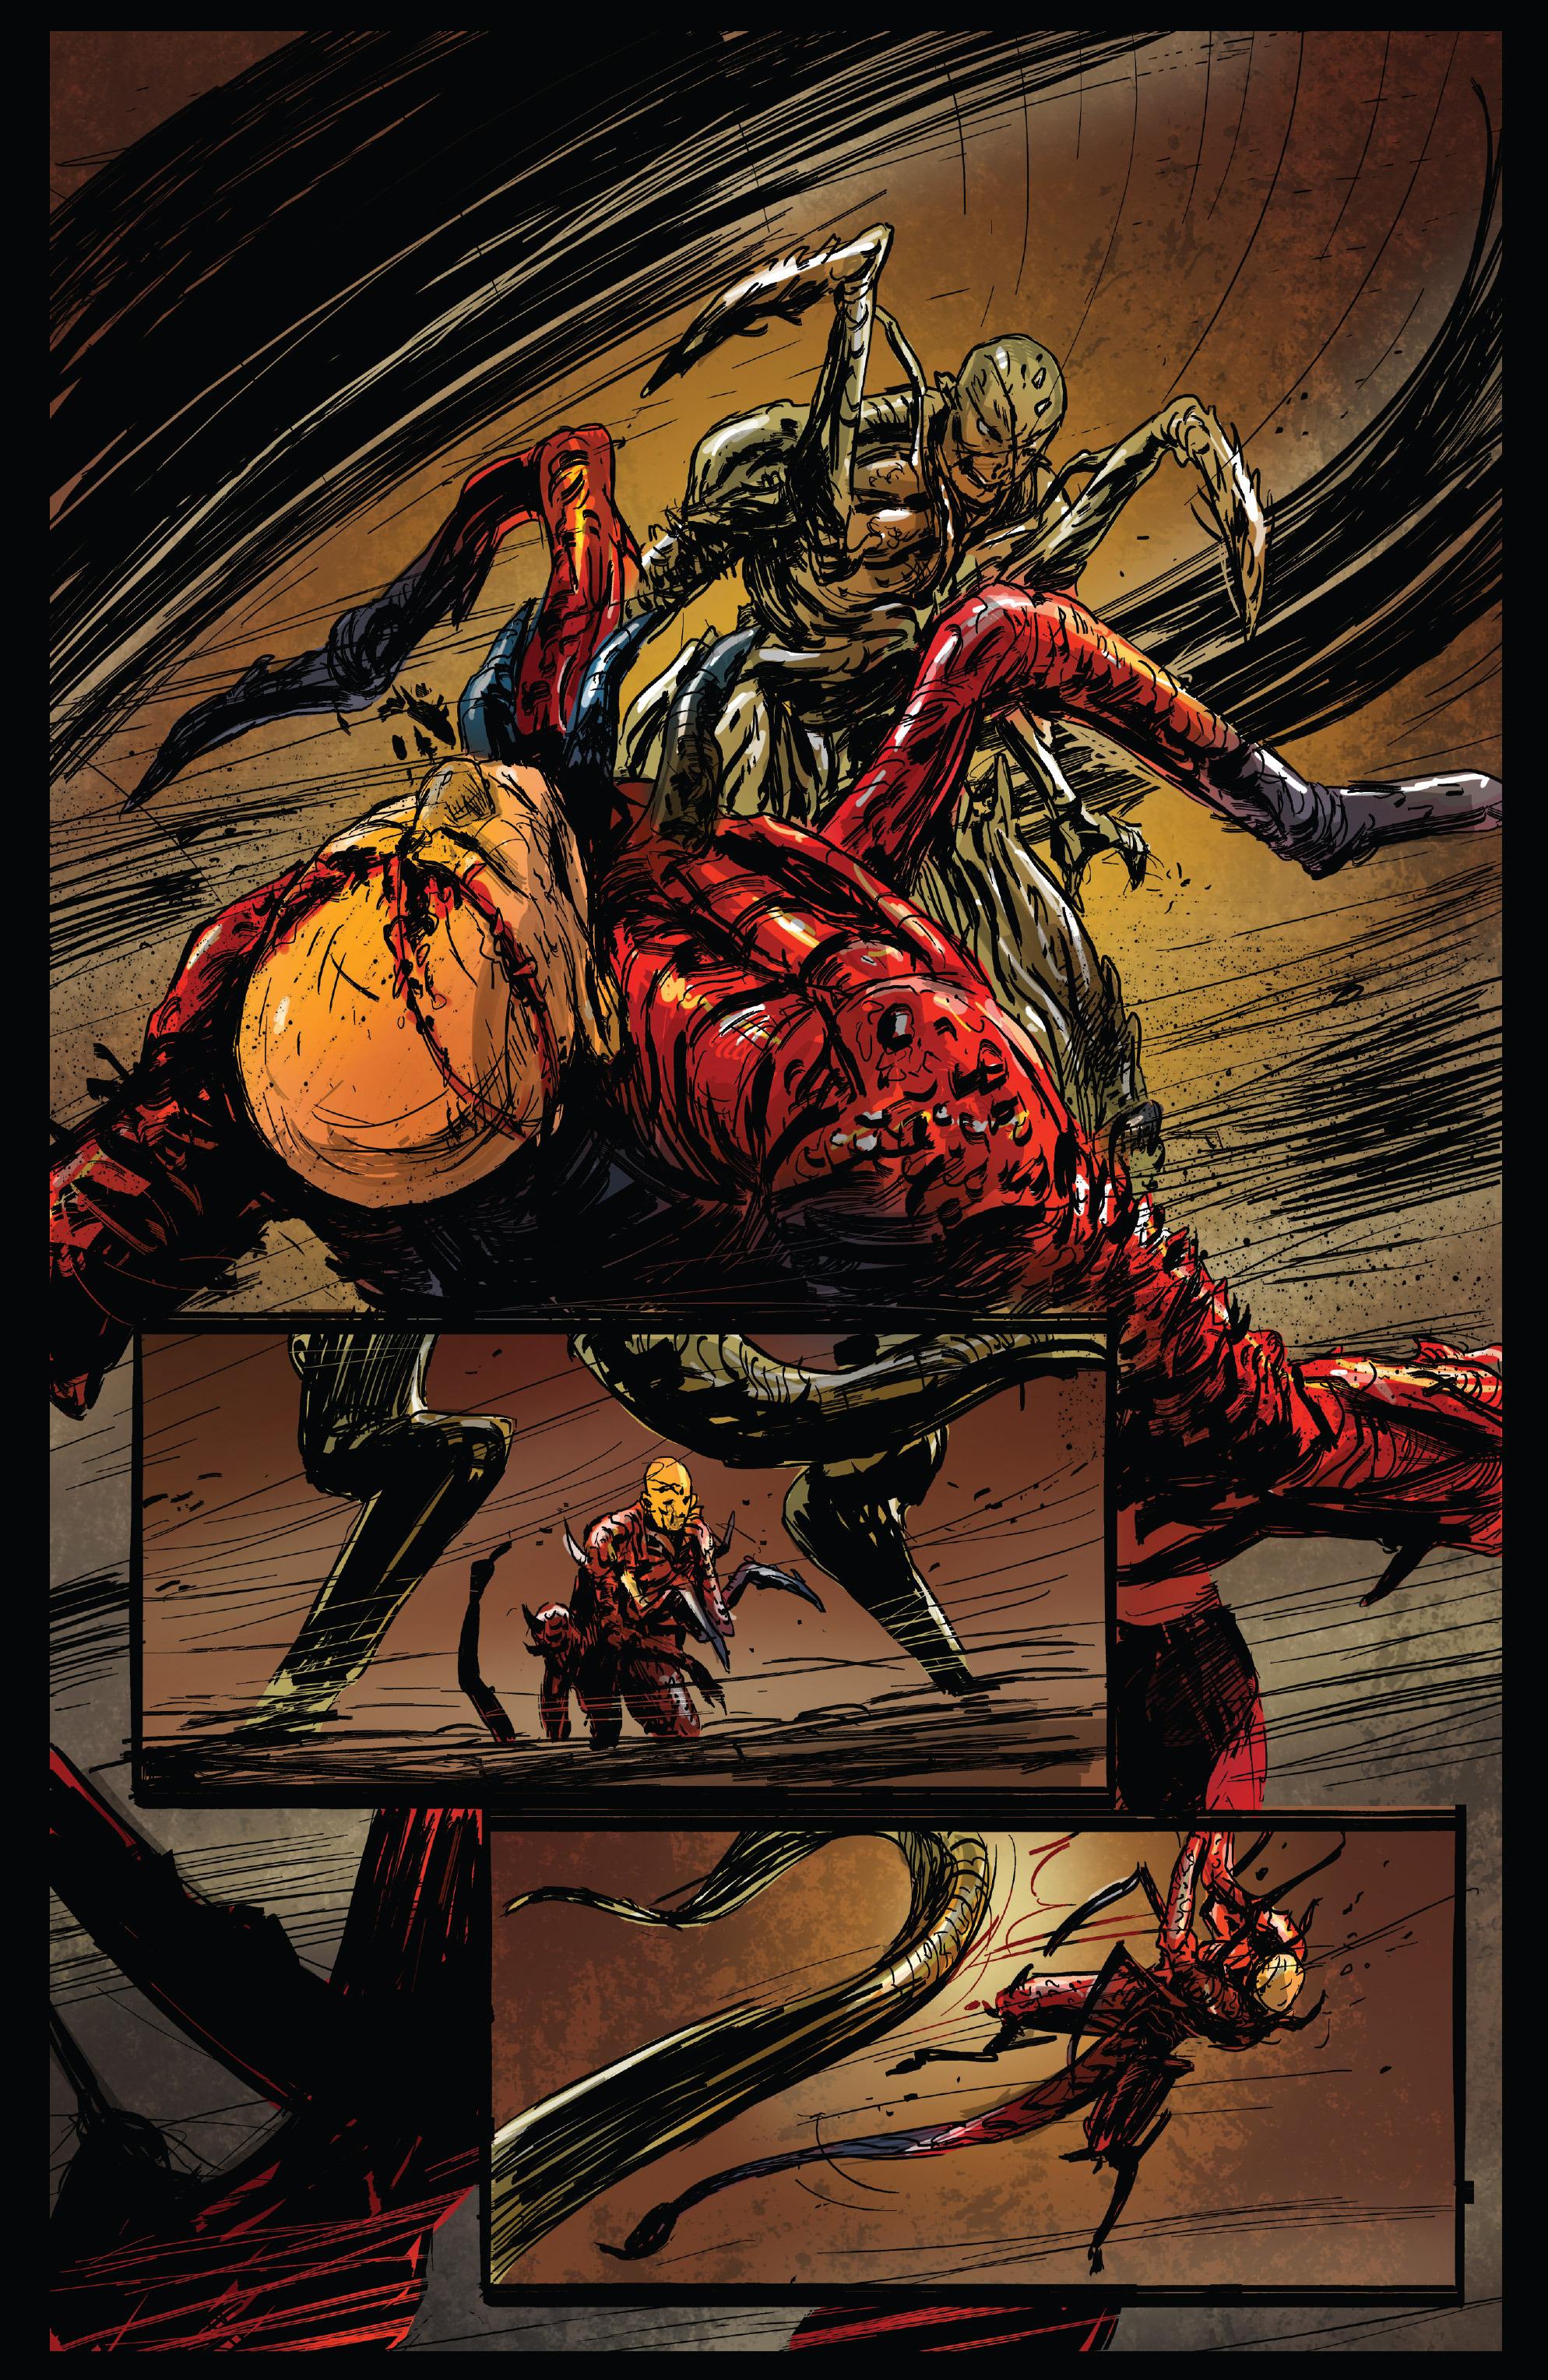 Read online Clive Barker's Hellraiser: The Dark Watch comic -  Issue # TPB 3 - 10